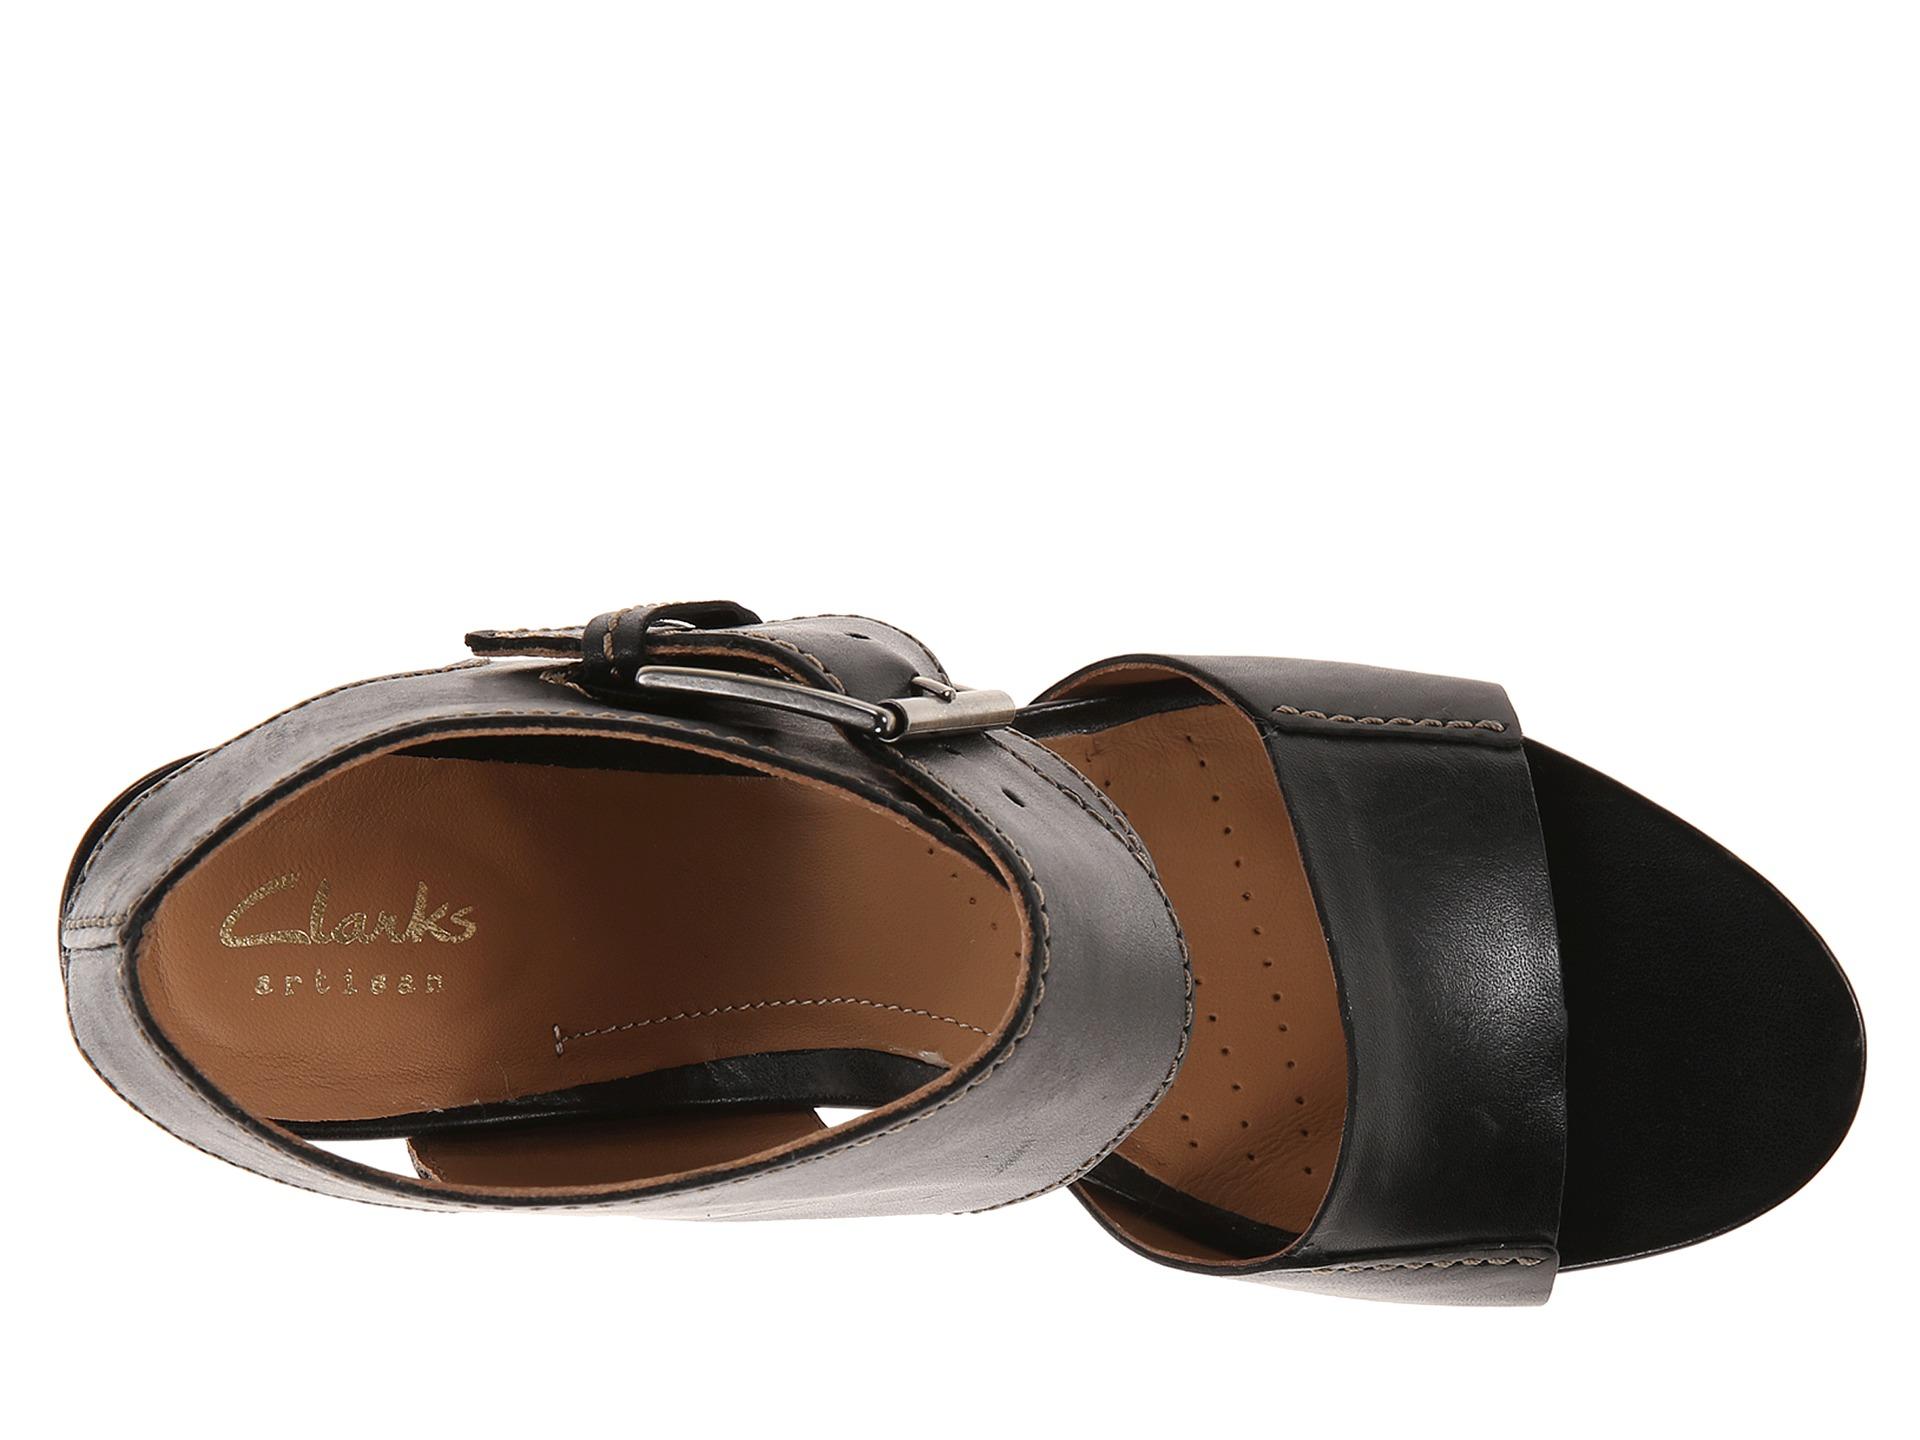 Agacharse Machu Picchu Imaginativo  Aerosole Sandals: Clarks Artisan Sandals Zappos